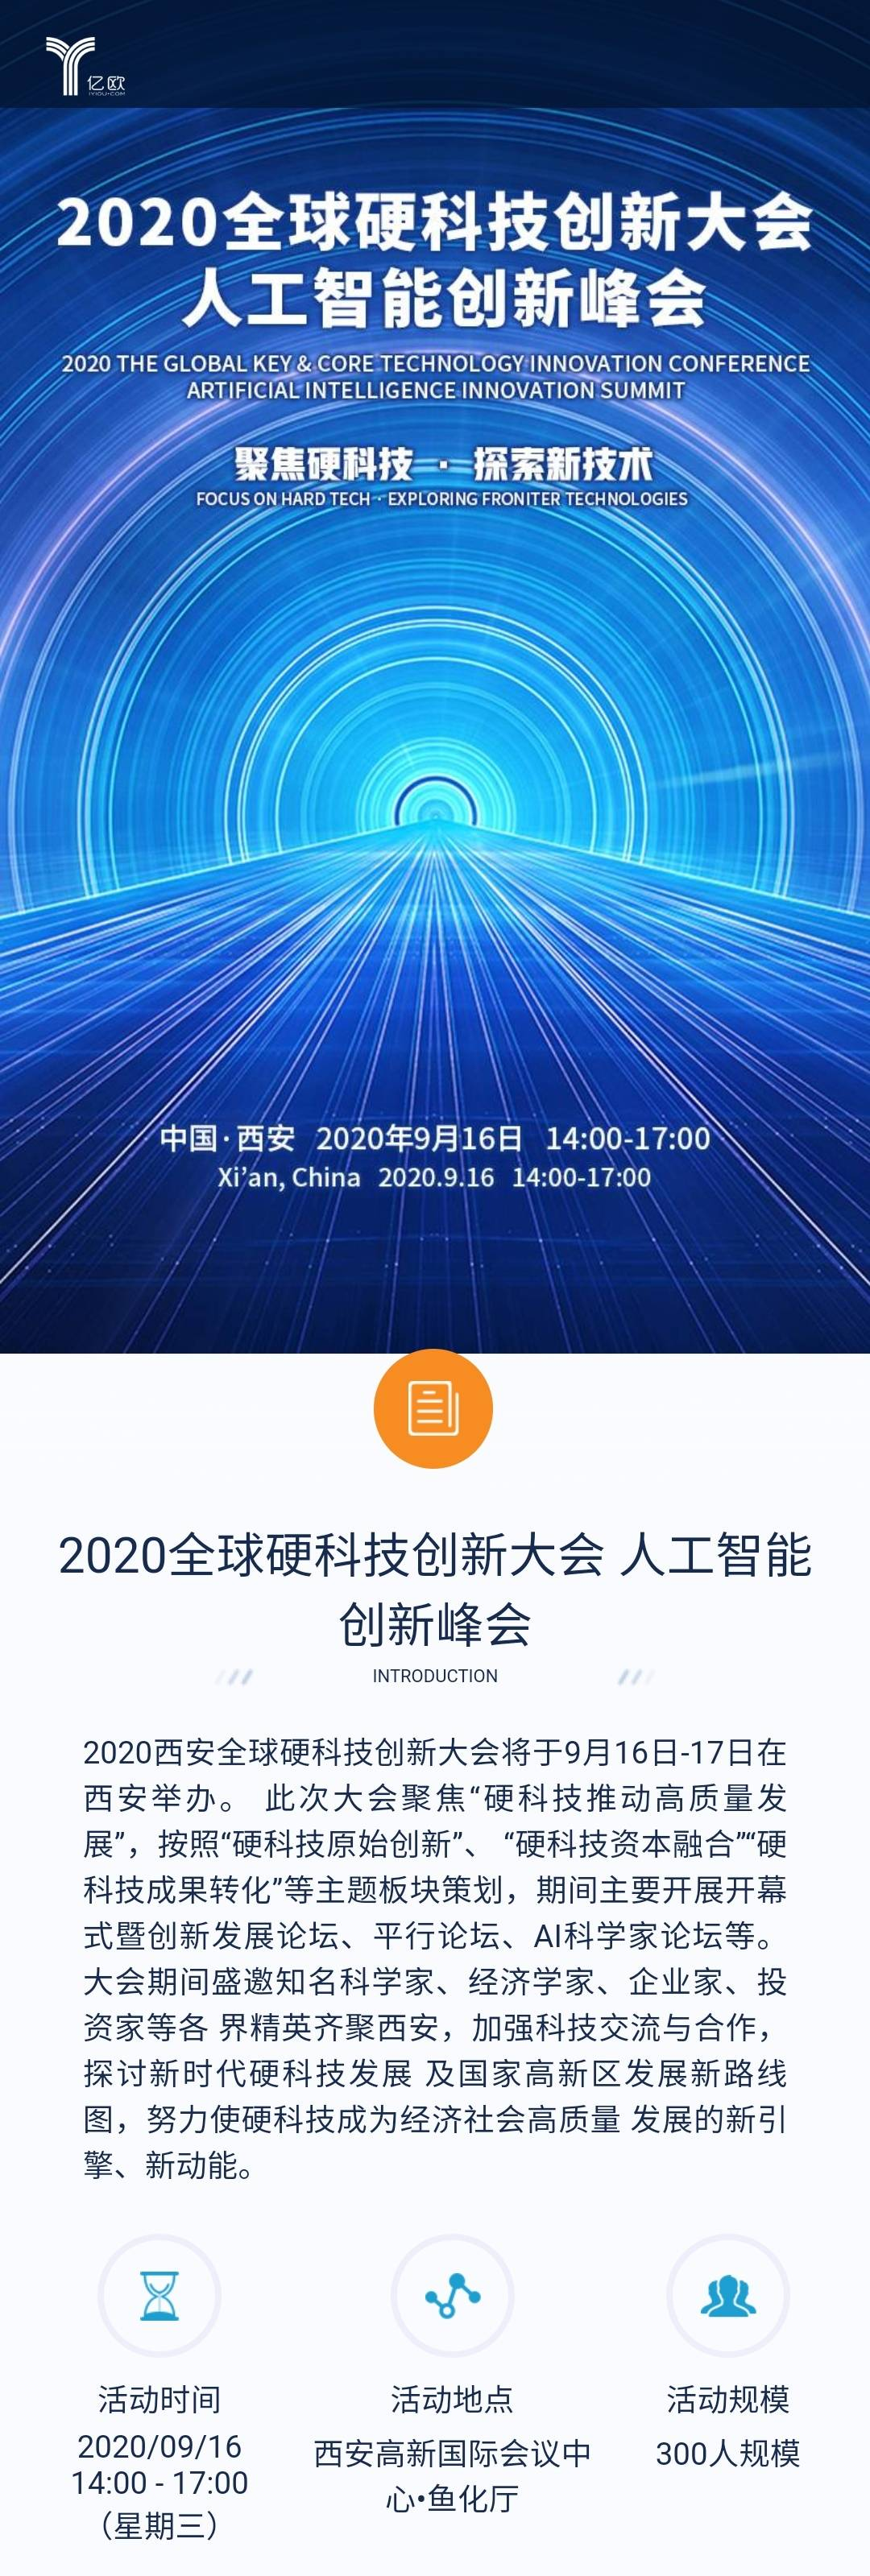 IMG_20200911_140411.jpg.jpg